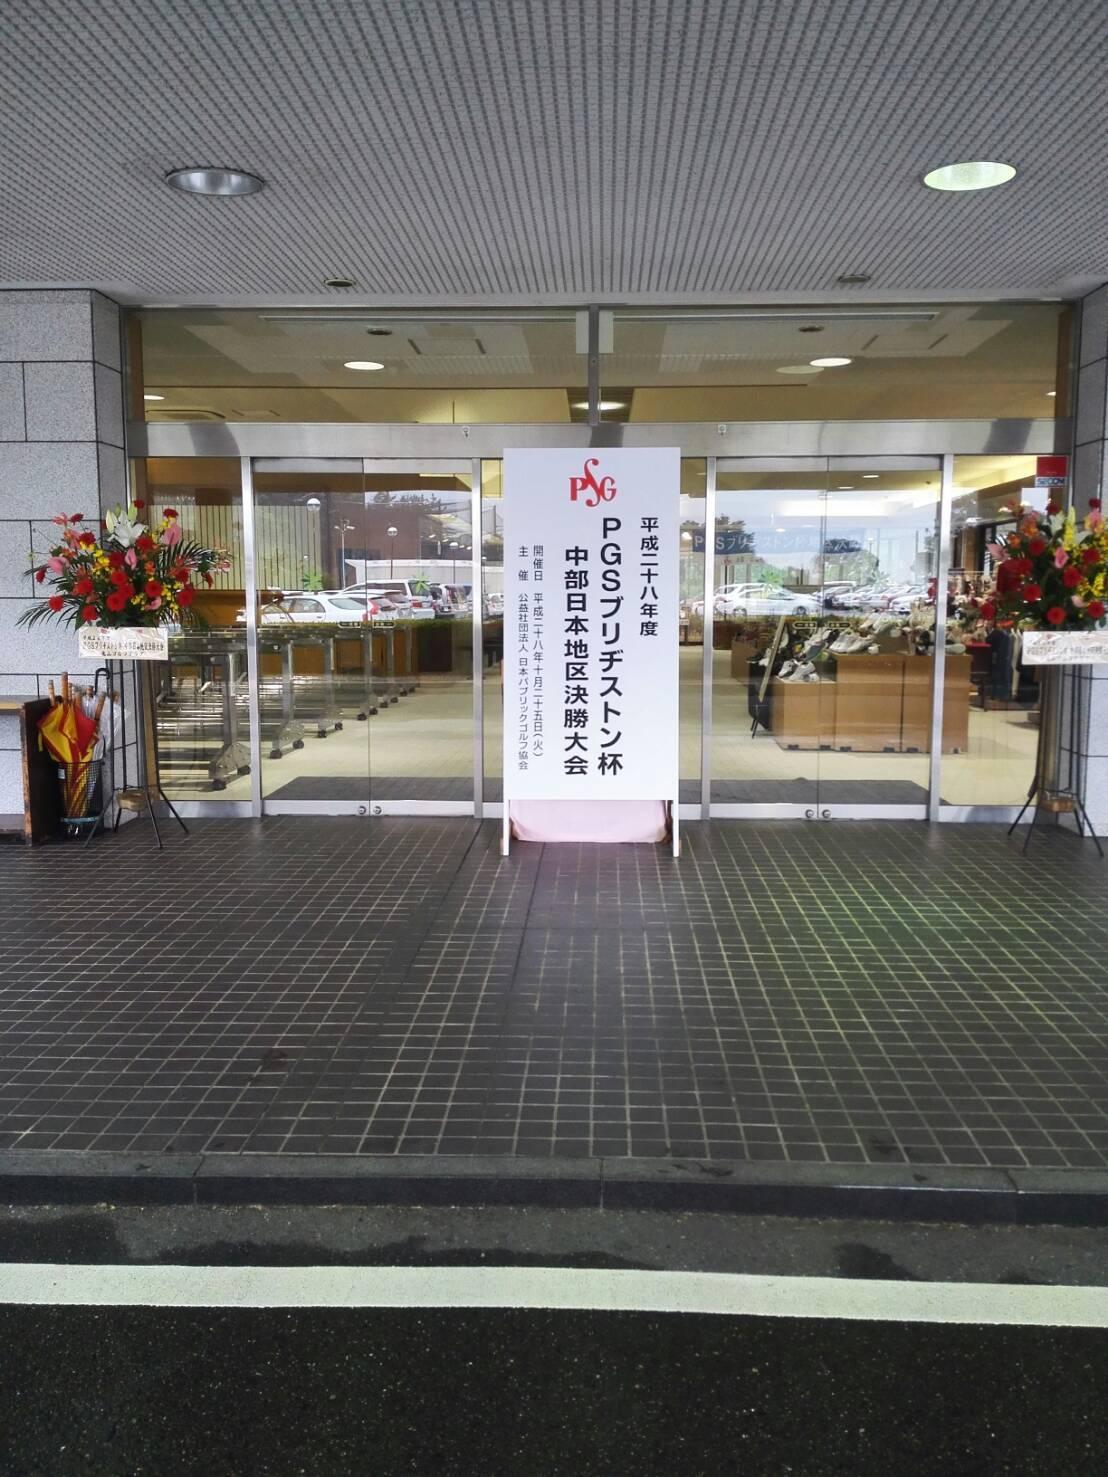 PGSブリヂストン杯 中部日本地区決勝大会結果_d0338682_11471554.jpg